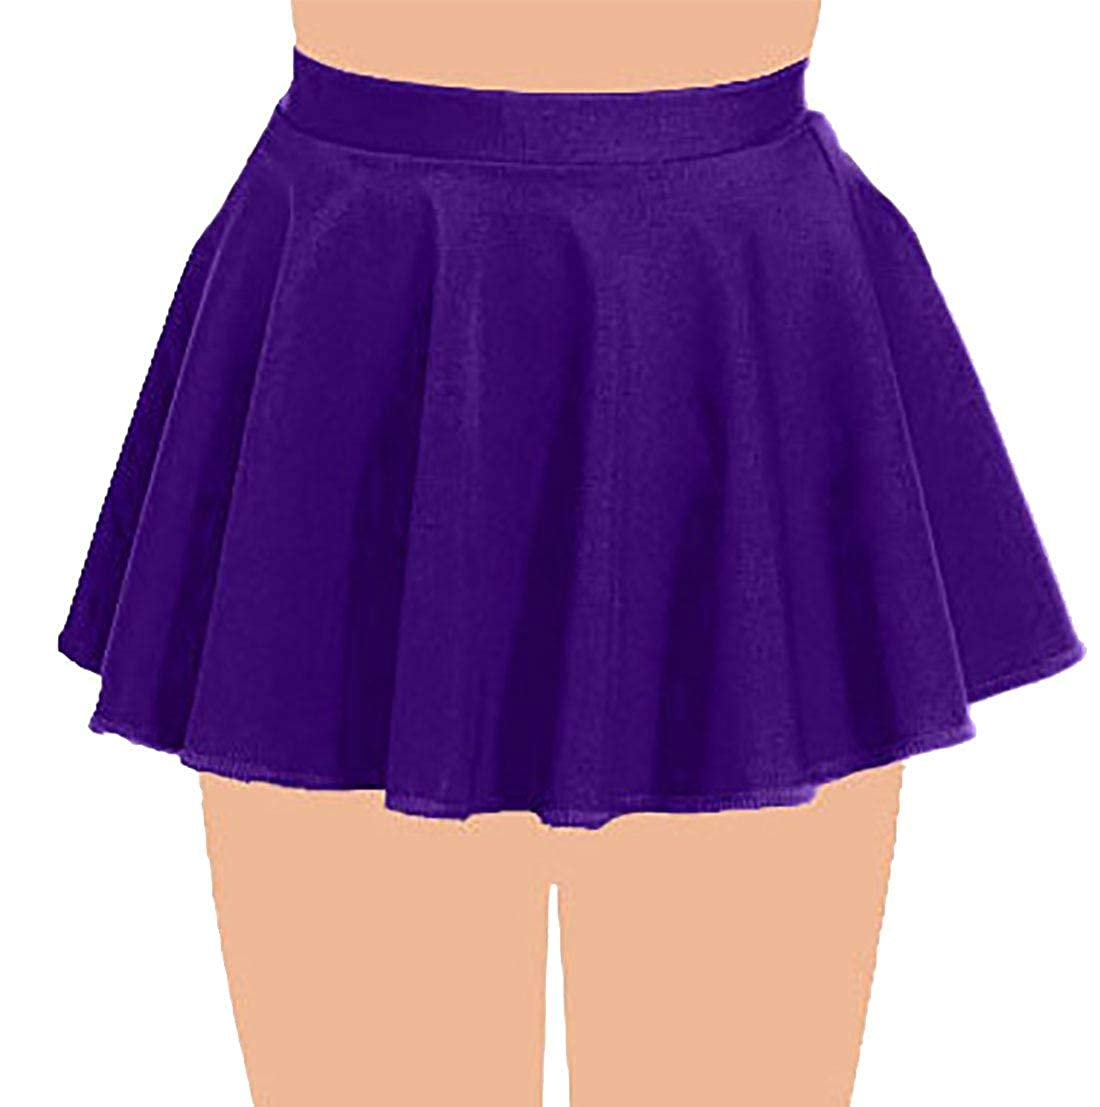 DIGITAL SPOT Kids Ballet Skating Tap Jazz Gymnastics Tutu Skirt Girls Circular Dance Wear Skirt